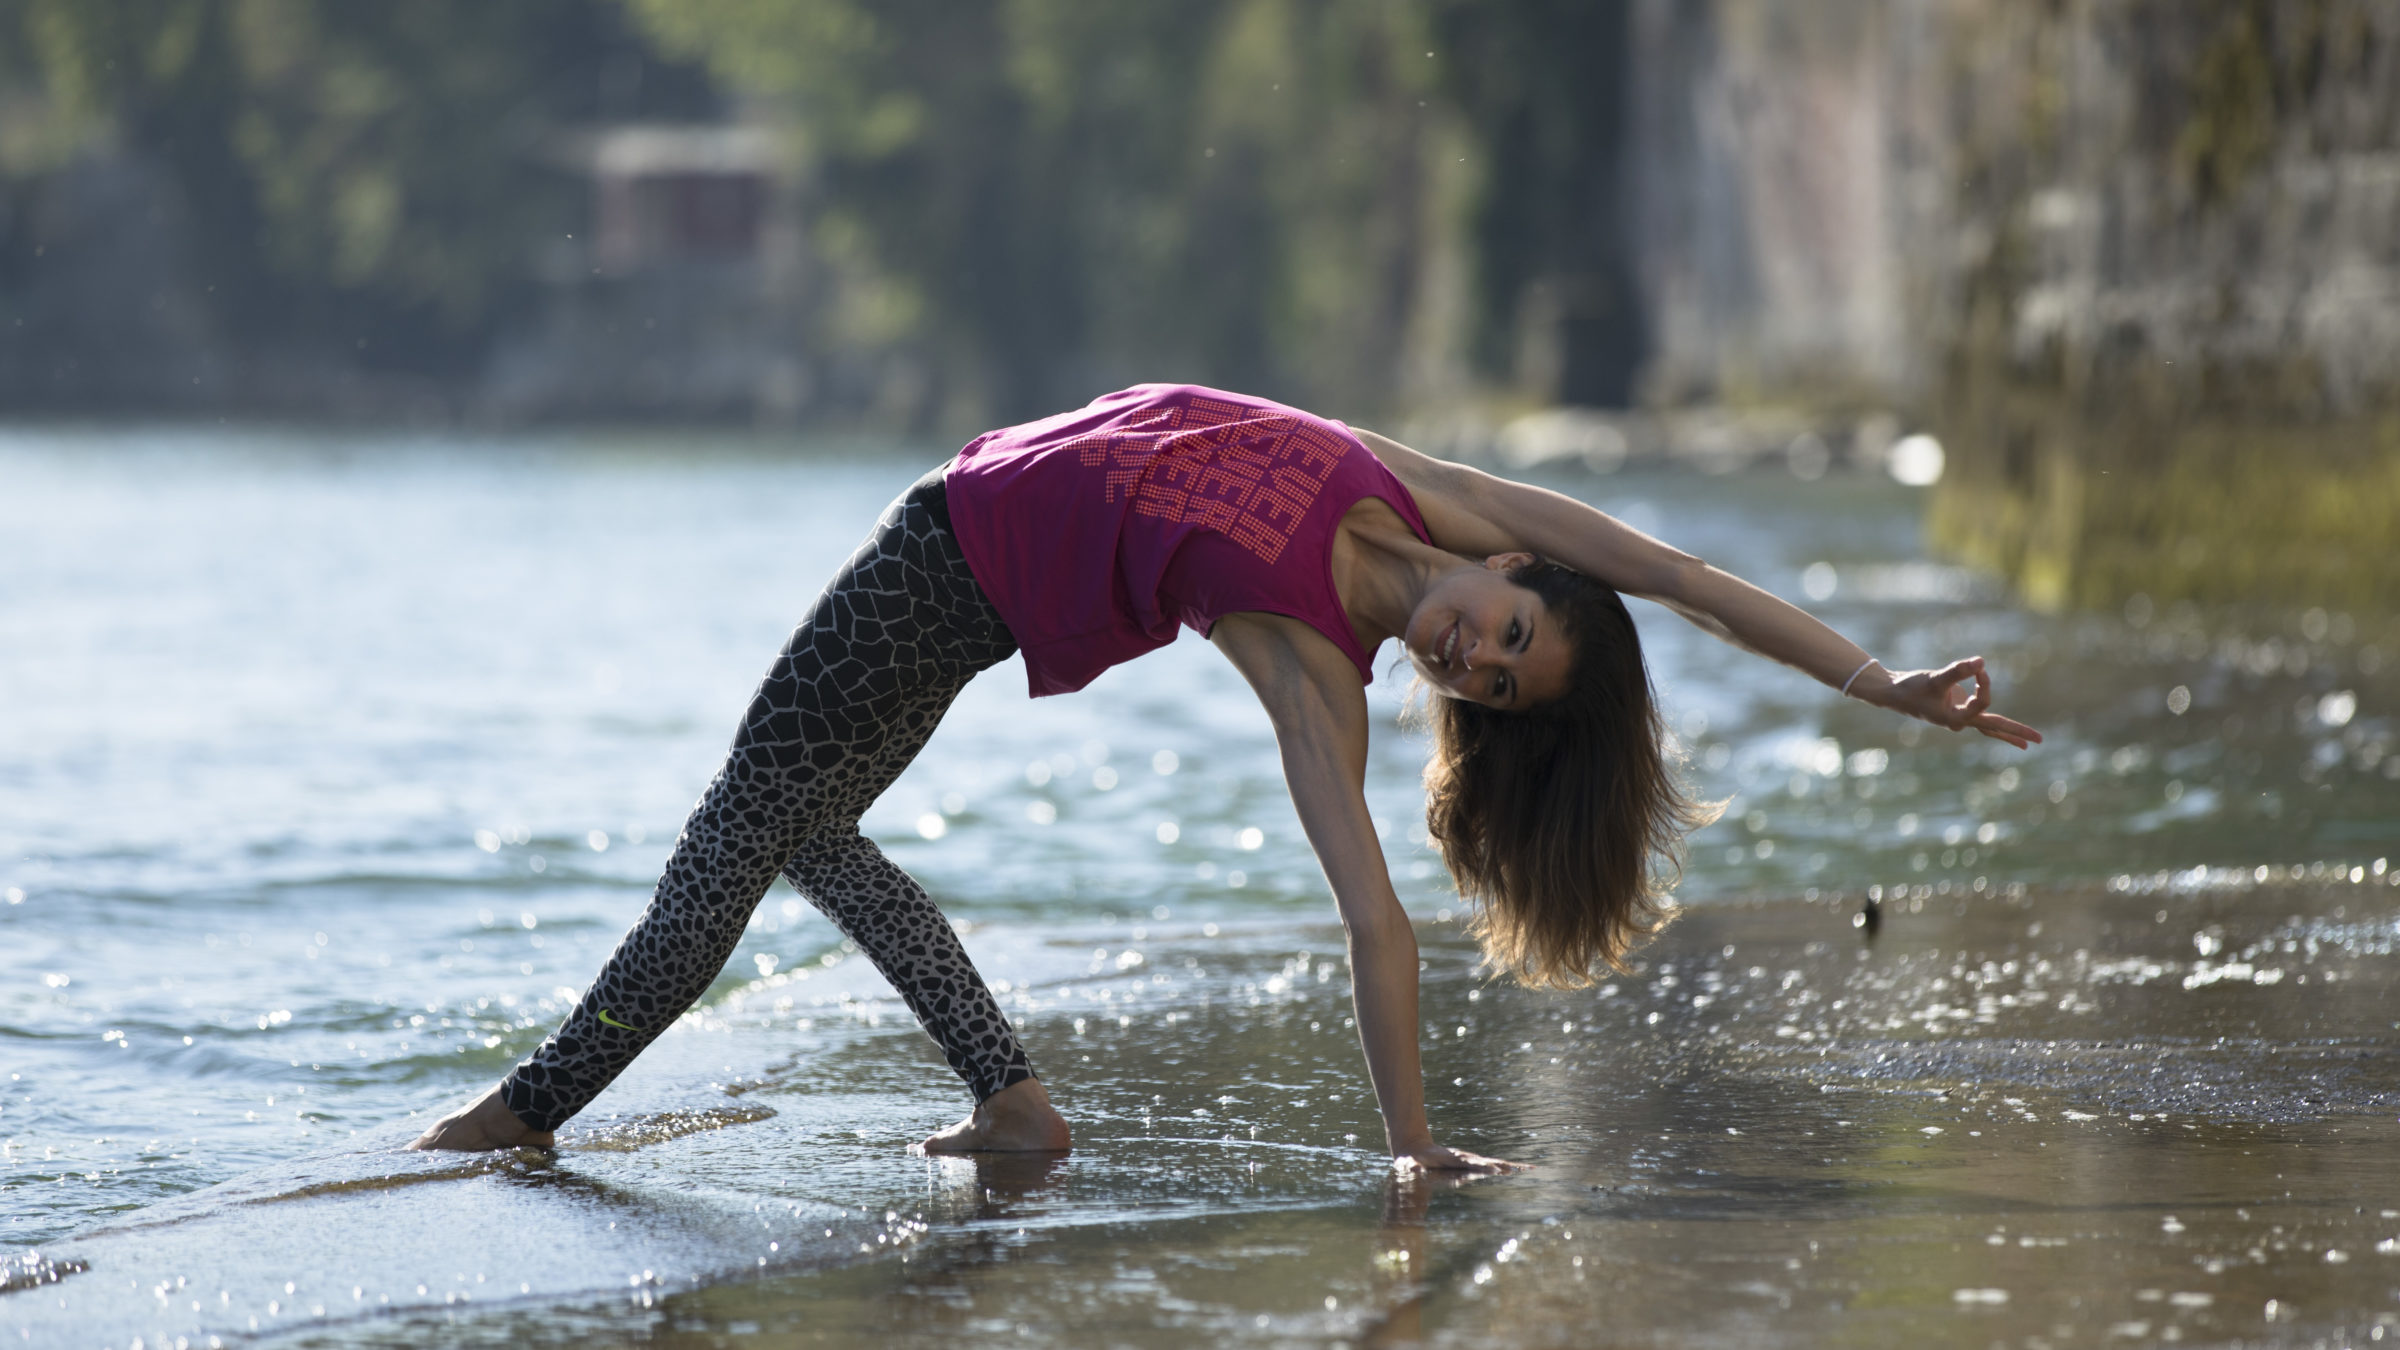 Elad Itzkin Yoga Photography - Anna Kiyhankhadiv ELAD9692